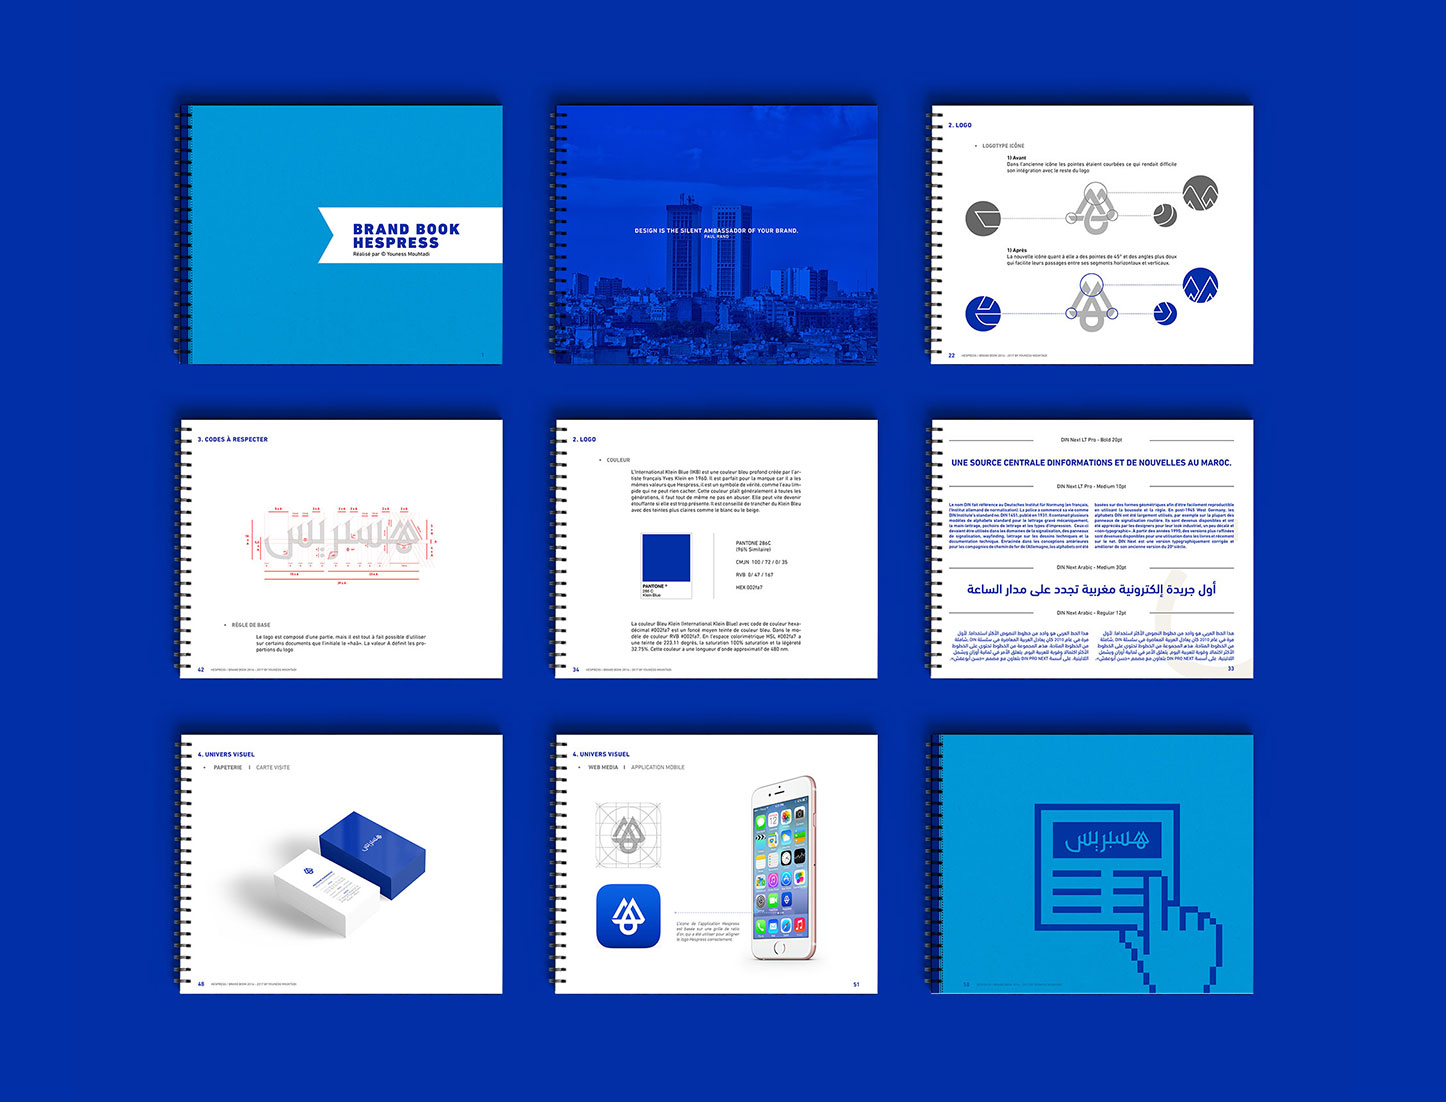 branding-hespress-logo-corporate-design-mouhtadi-design_03